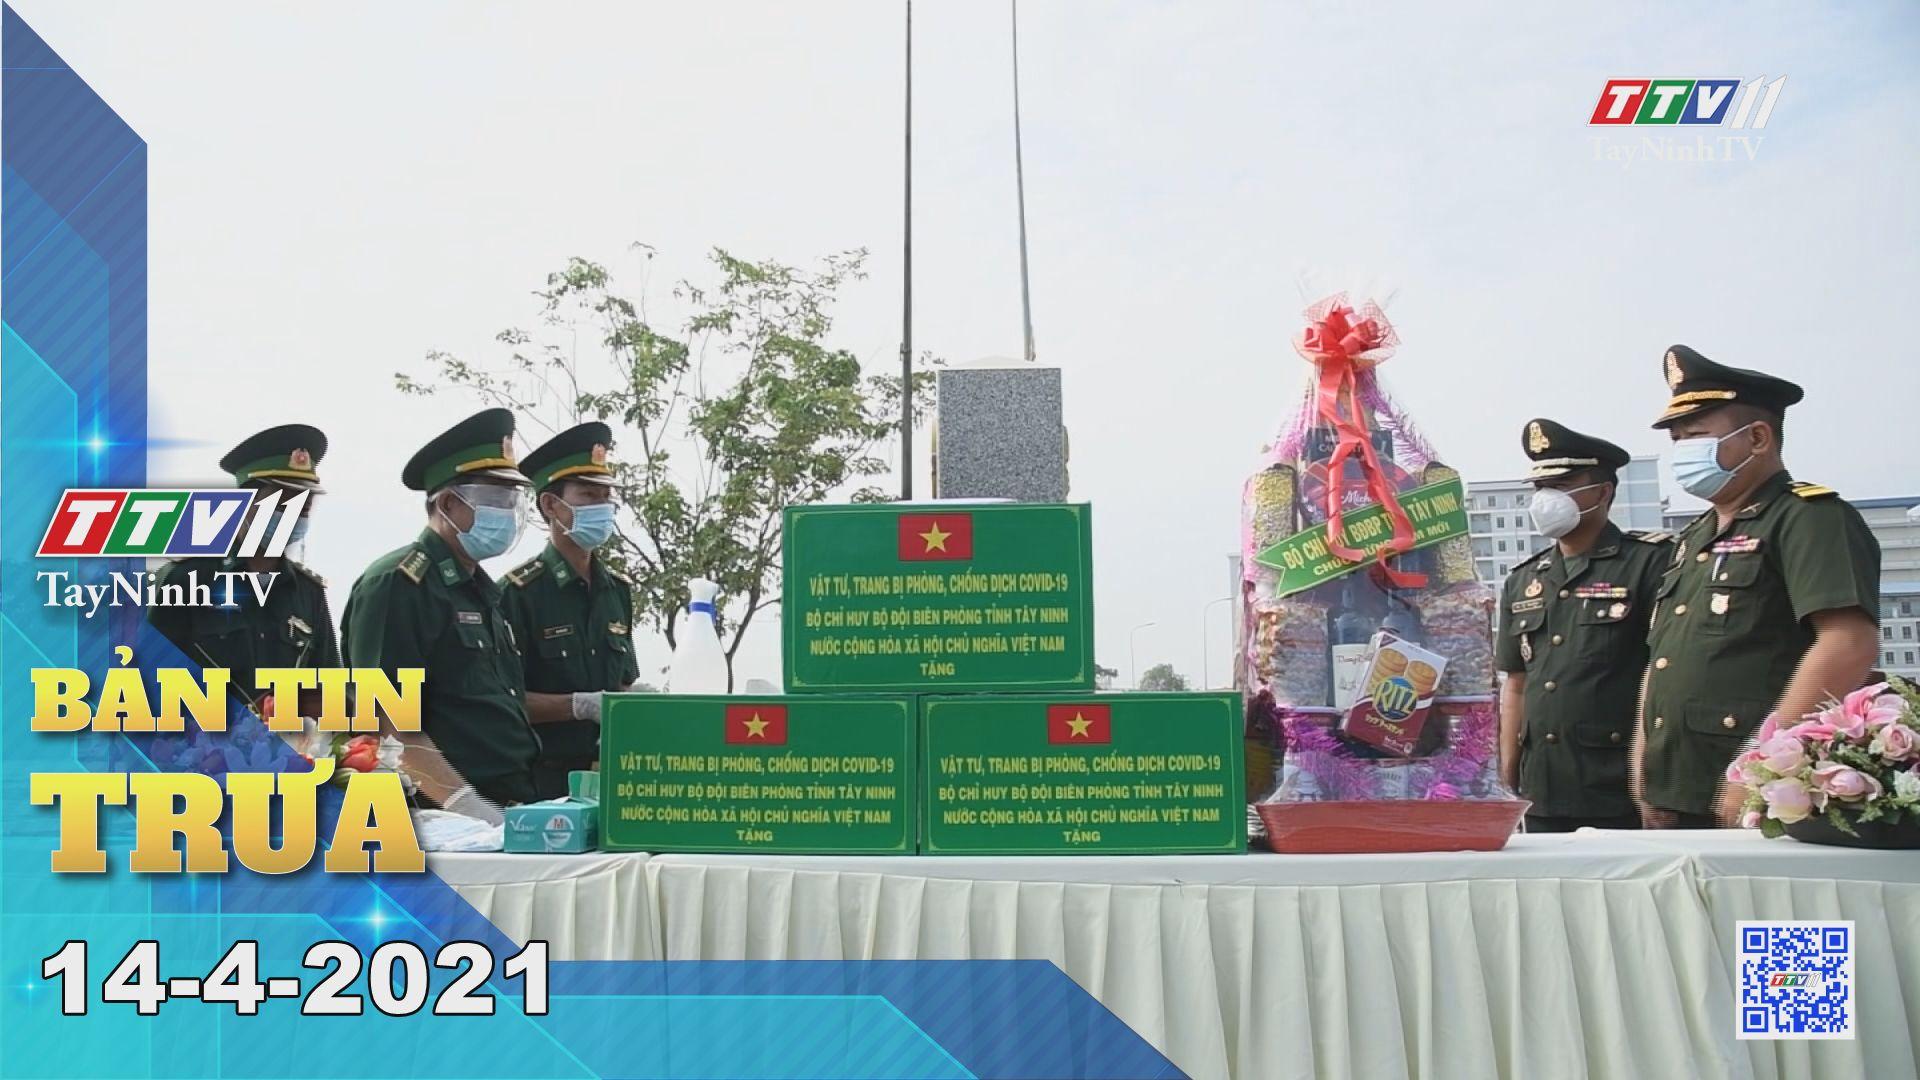 Bản tin trưa 14-4-2021 | Tin tức hôm nay | TayNinhTV